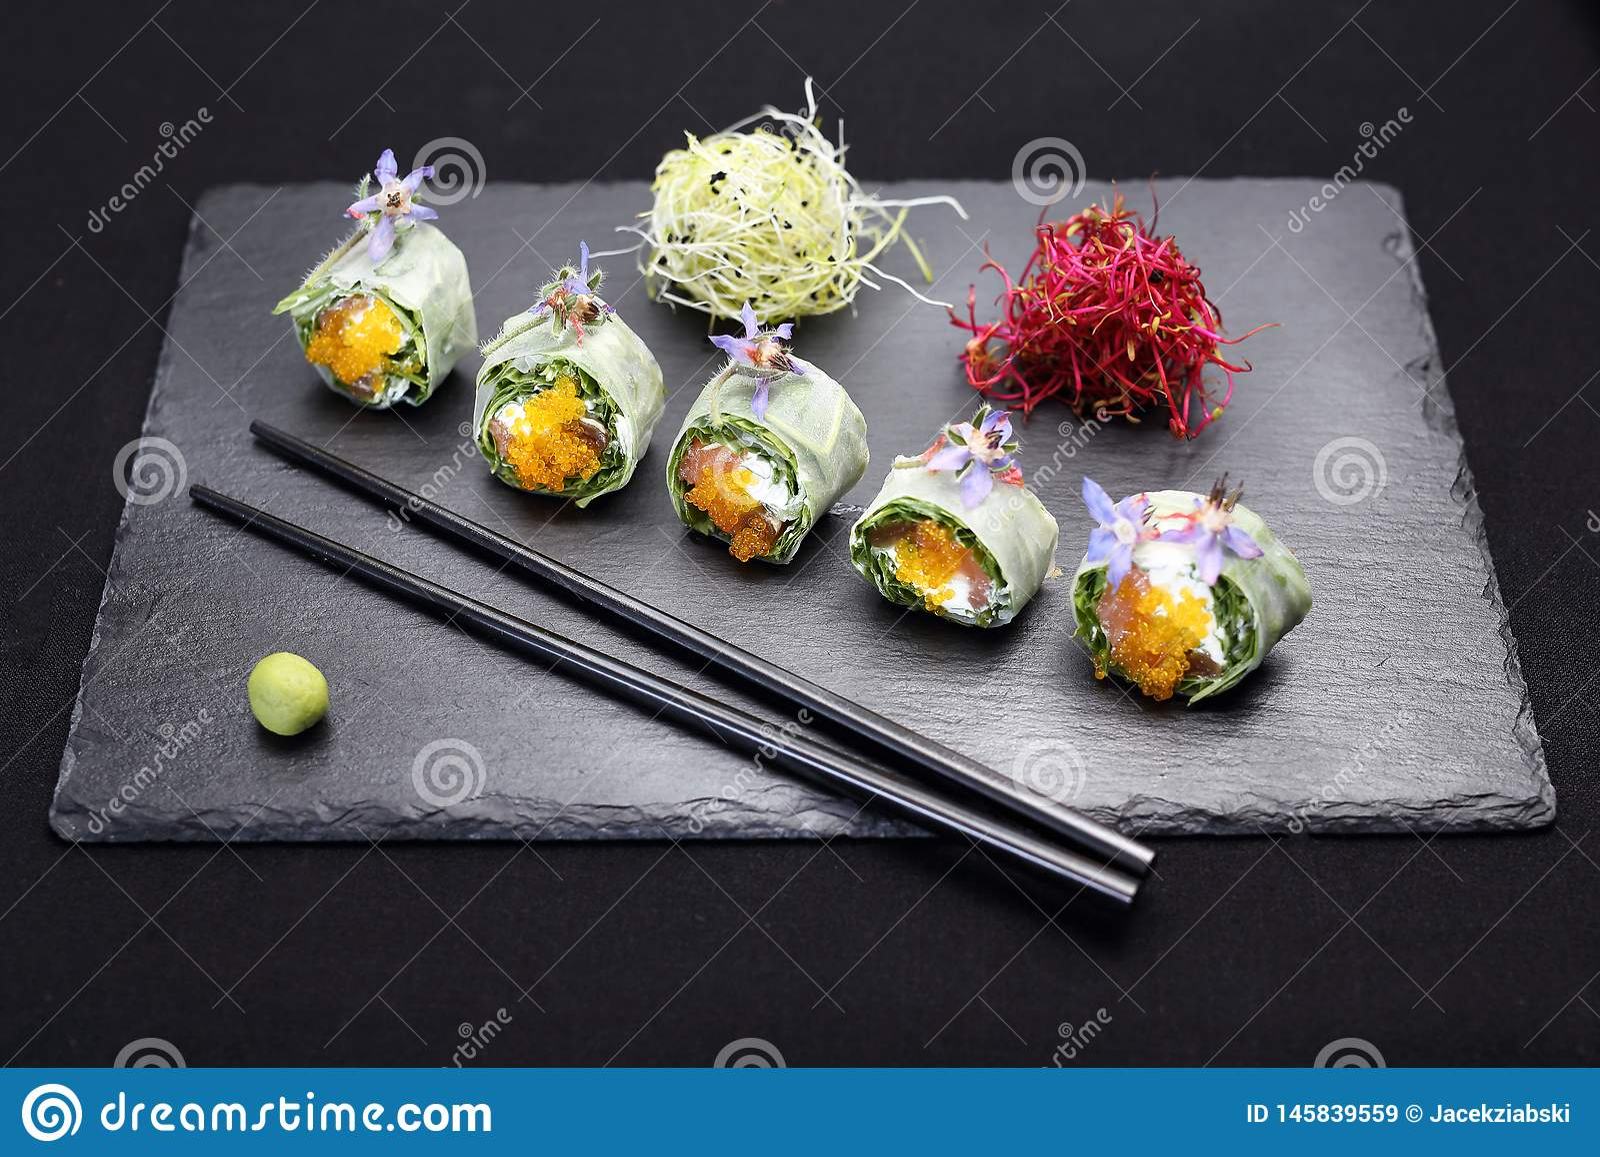 Sushi, sushi rolls with salmon, rucola, philadelphia cheese.